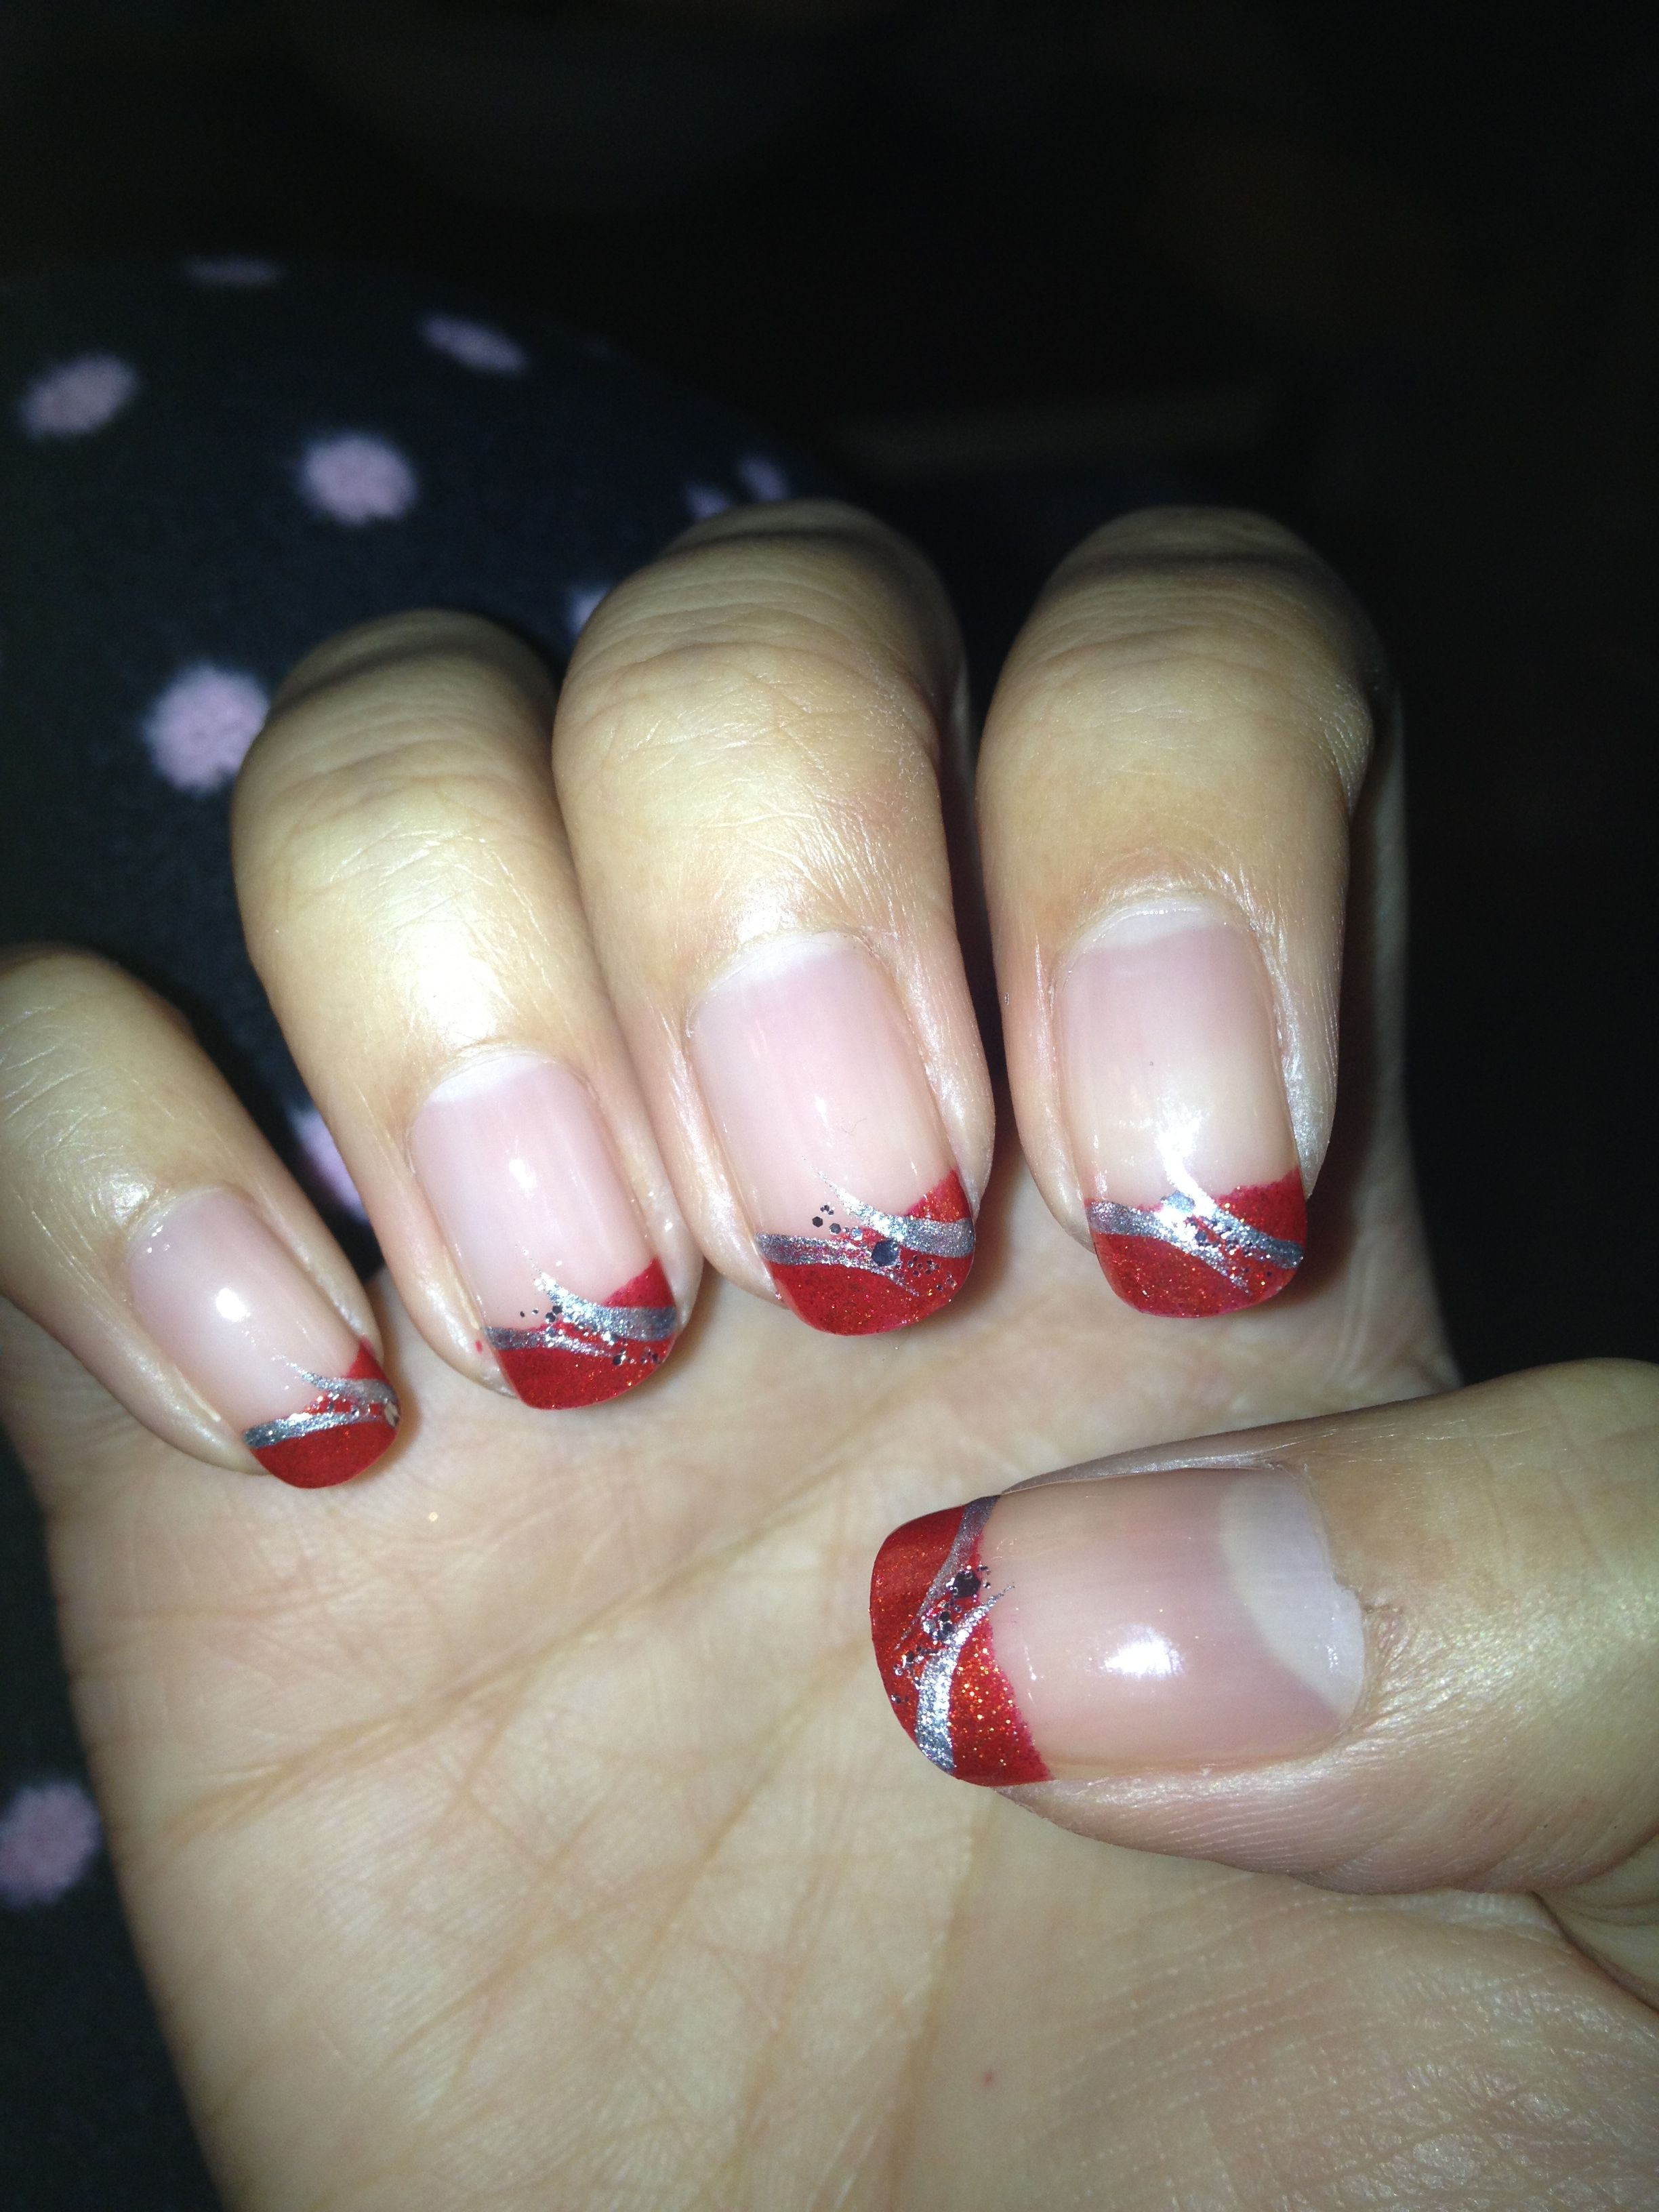 Dorable Red And Silver Nail Art Illustration - Nail Art Ideas ...